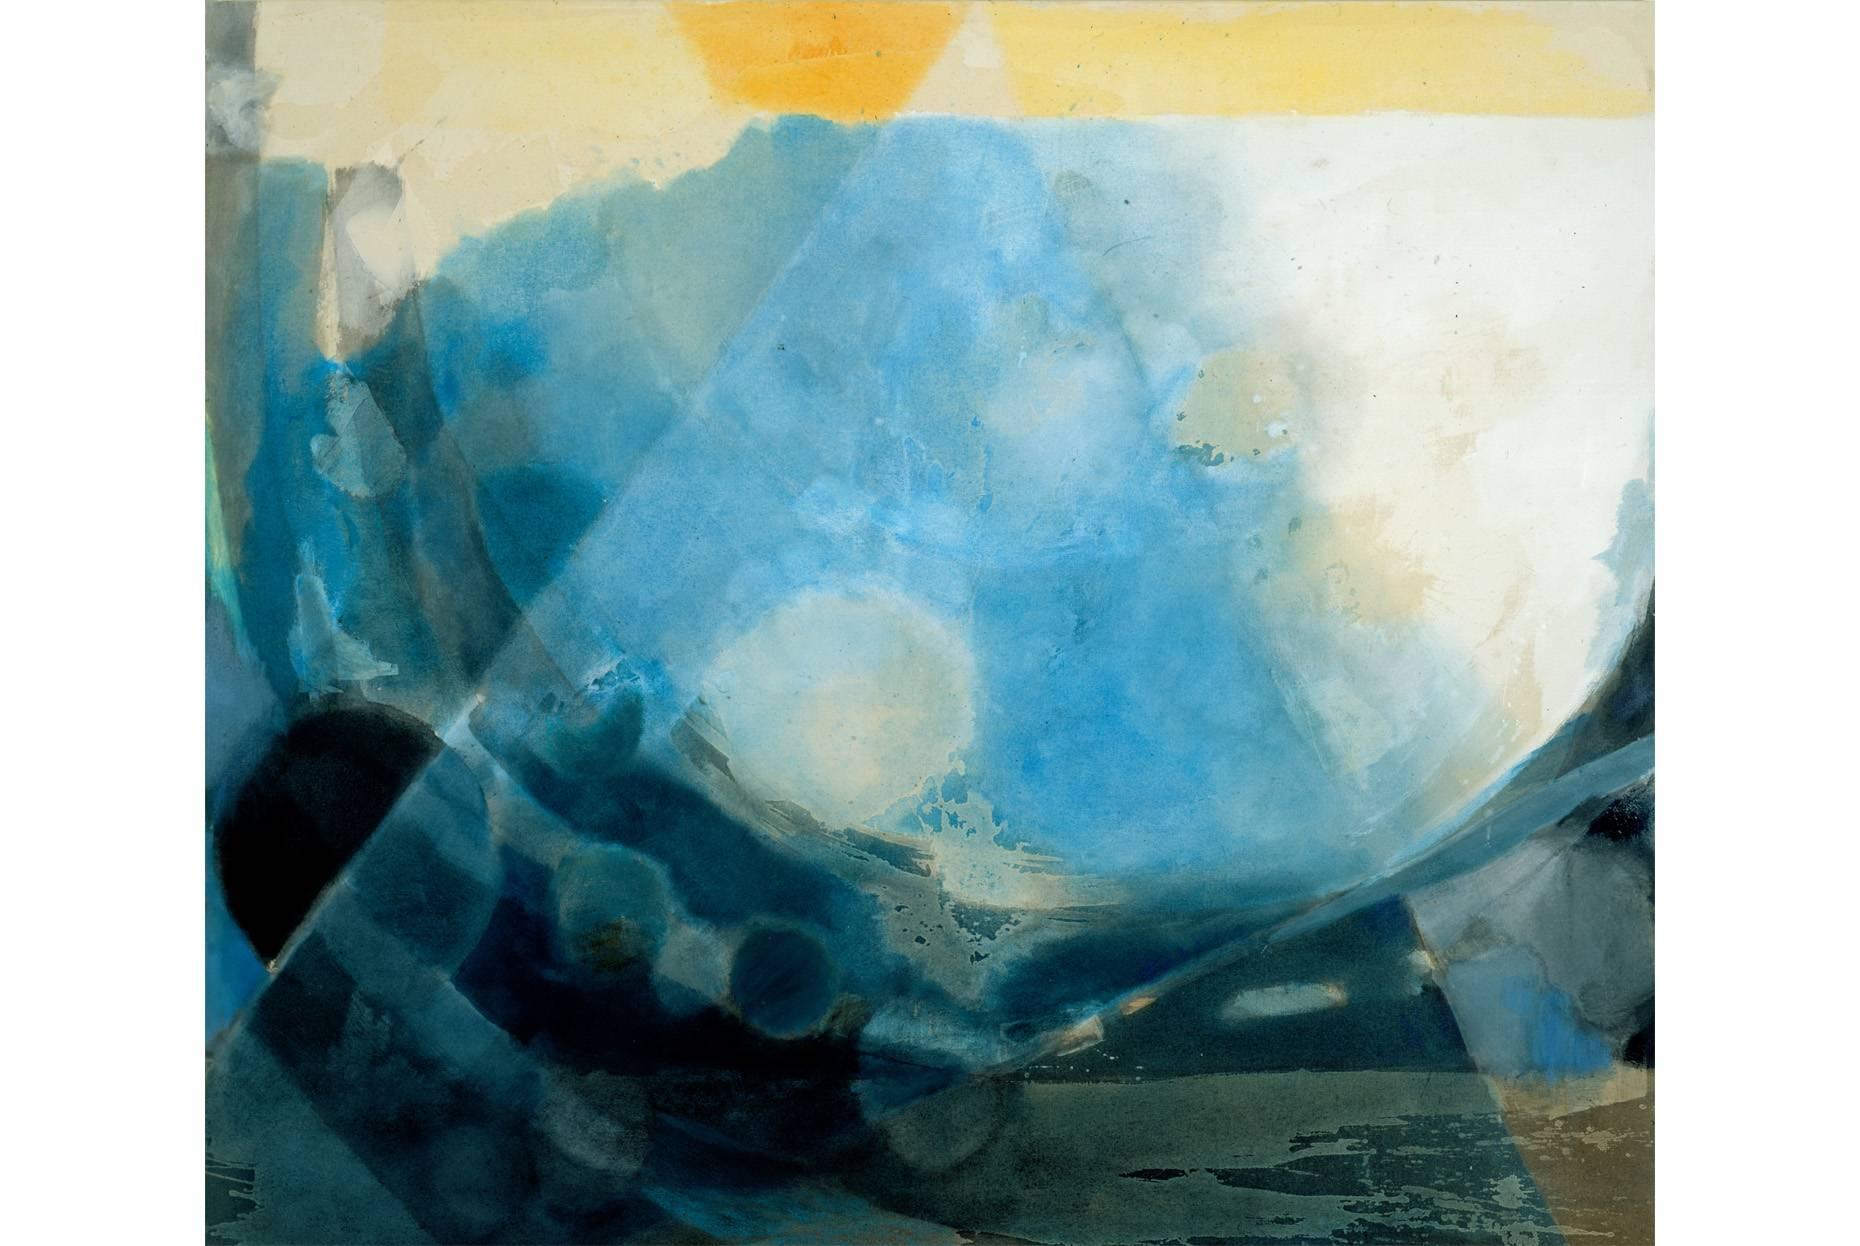 o.T. 1992 Pigment und Ölfarbe a/Nessel 170 x 190 cm